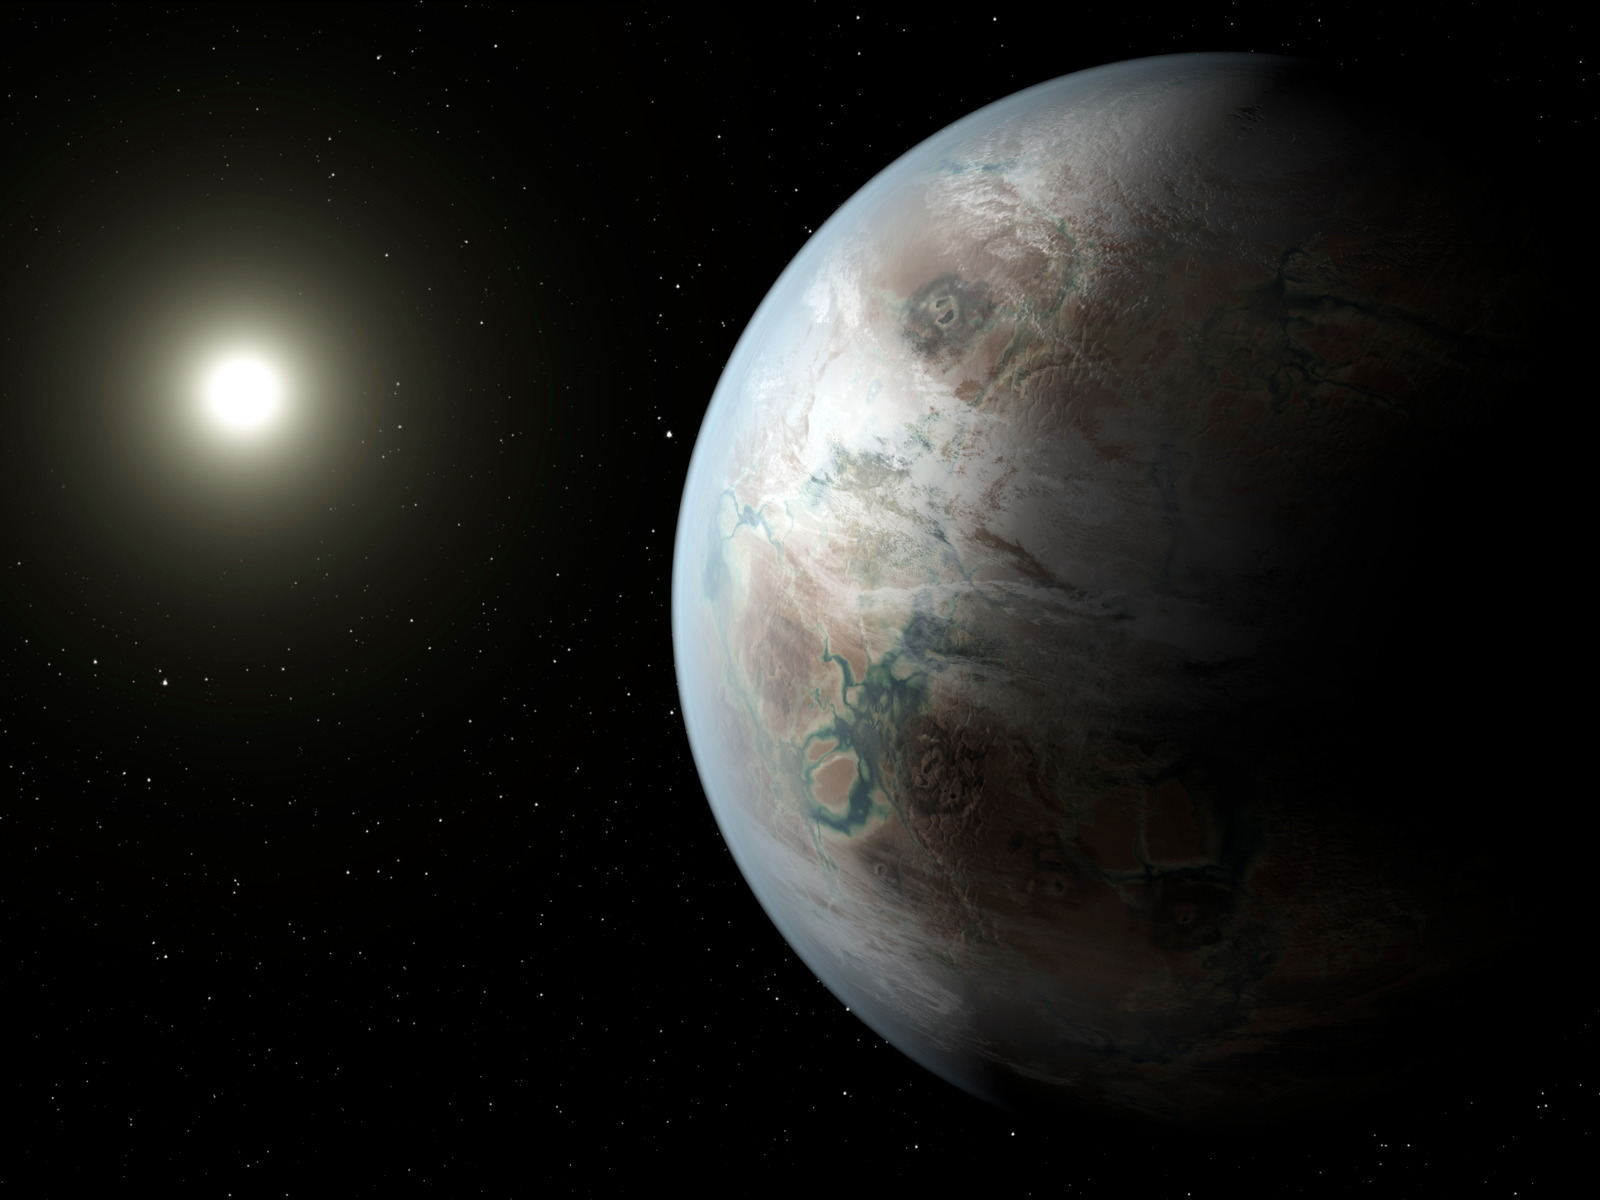 Earth-Like Exoplanet Kepler-452b | Space Wallpaper